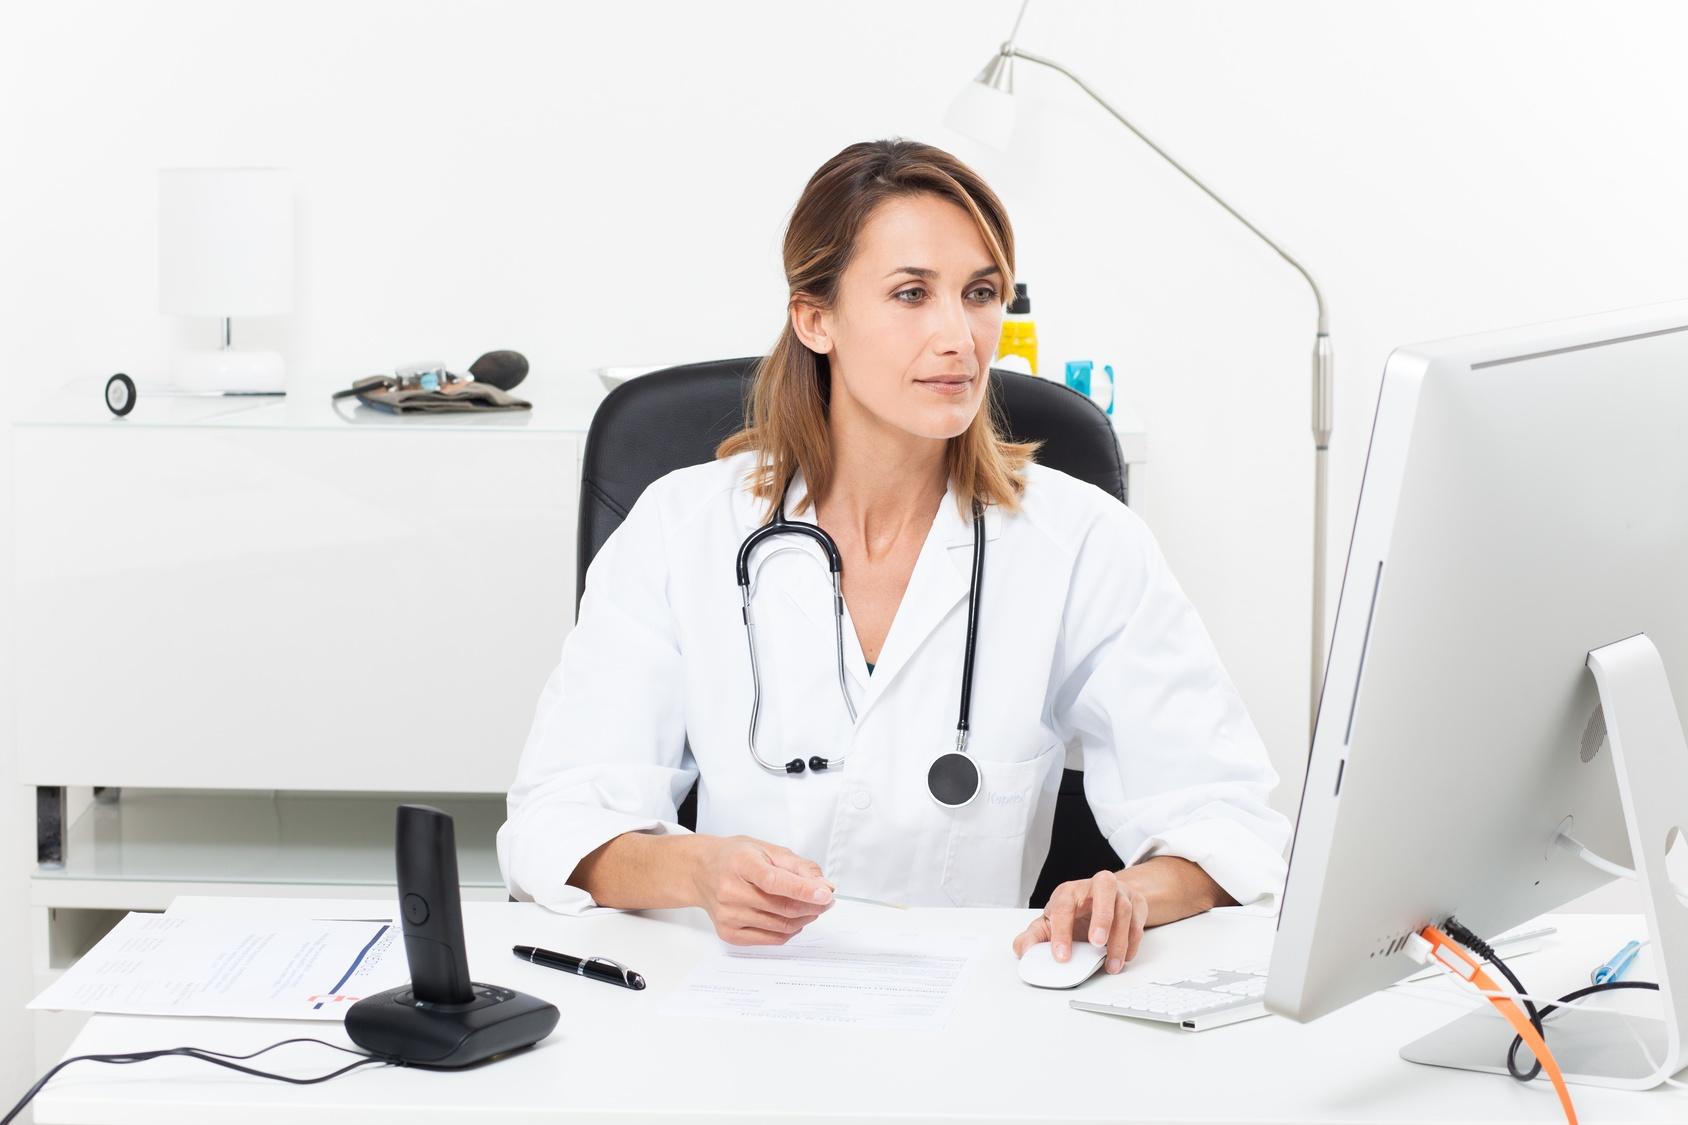 femme médecin en téléconsultation